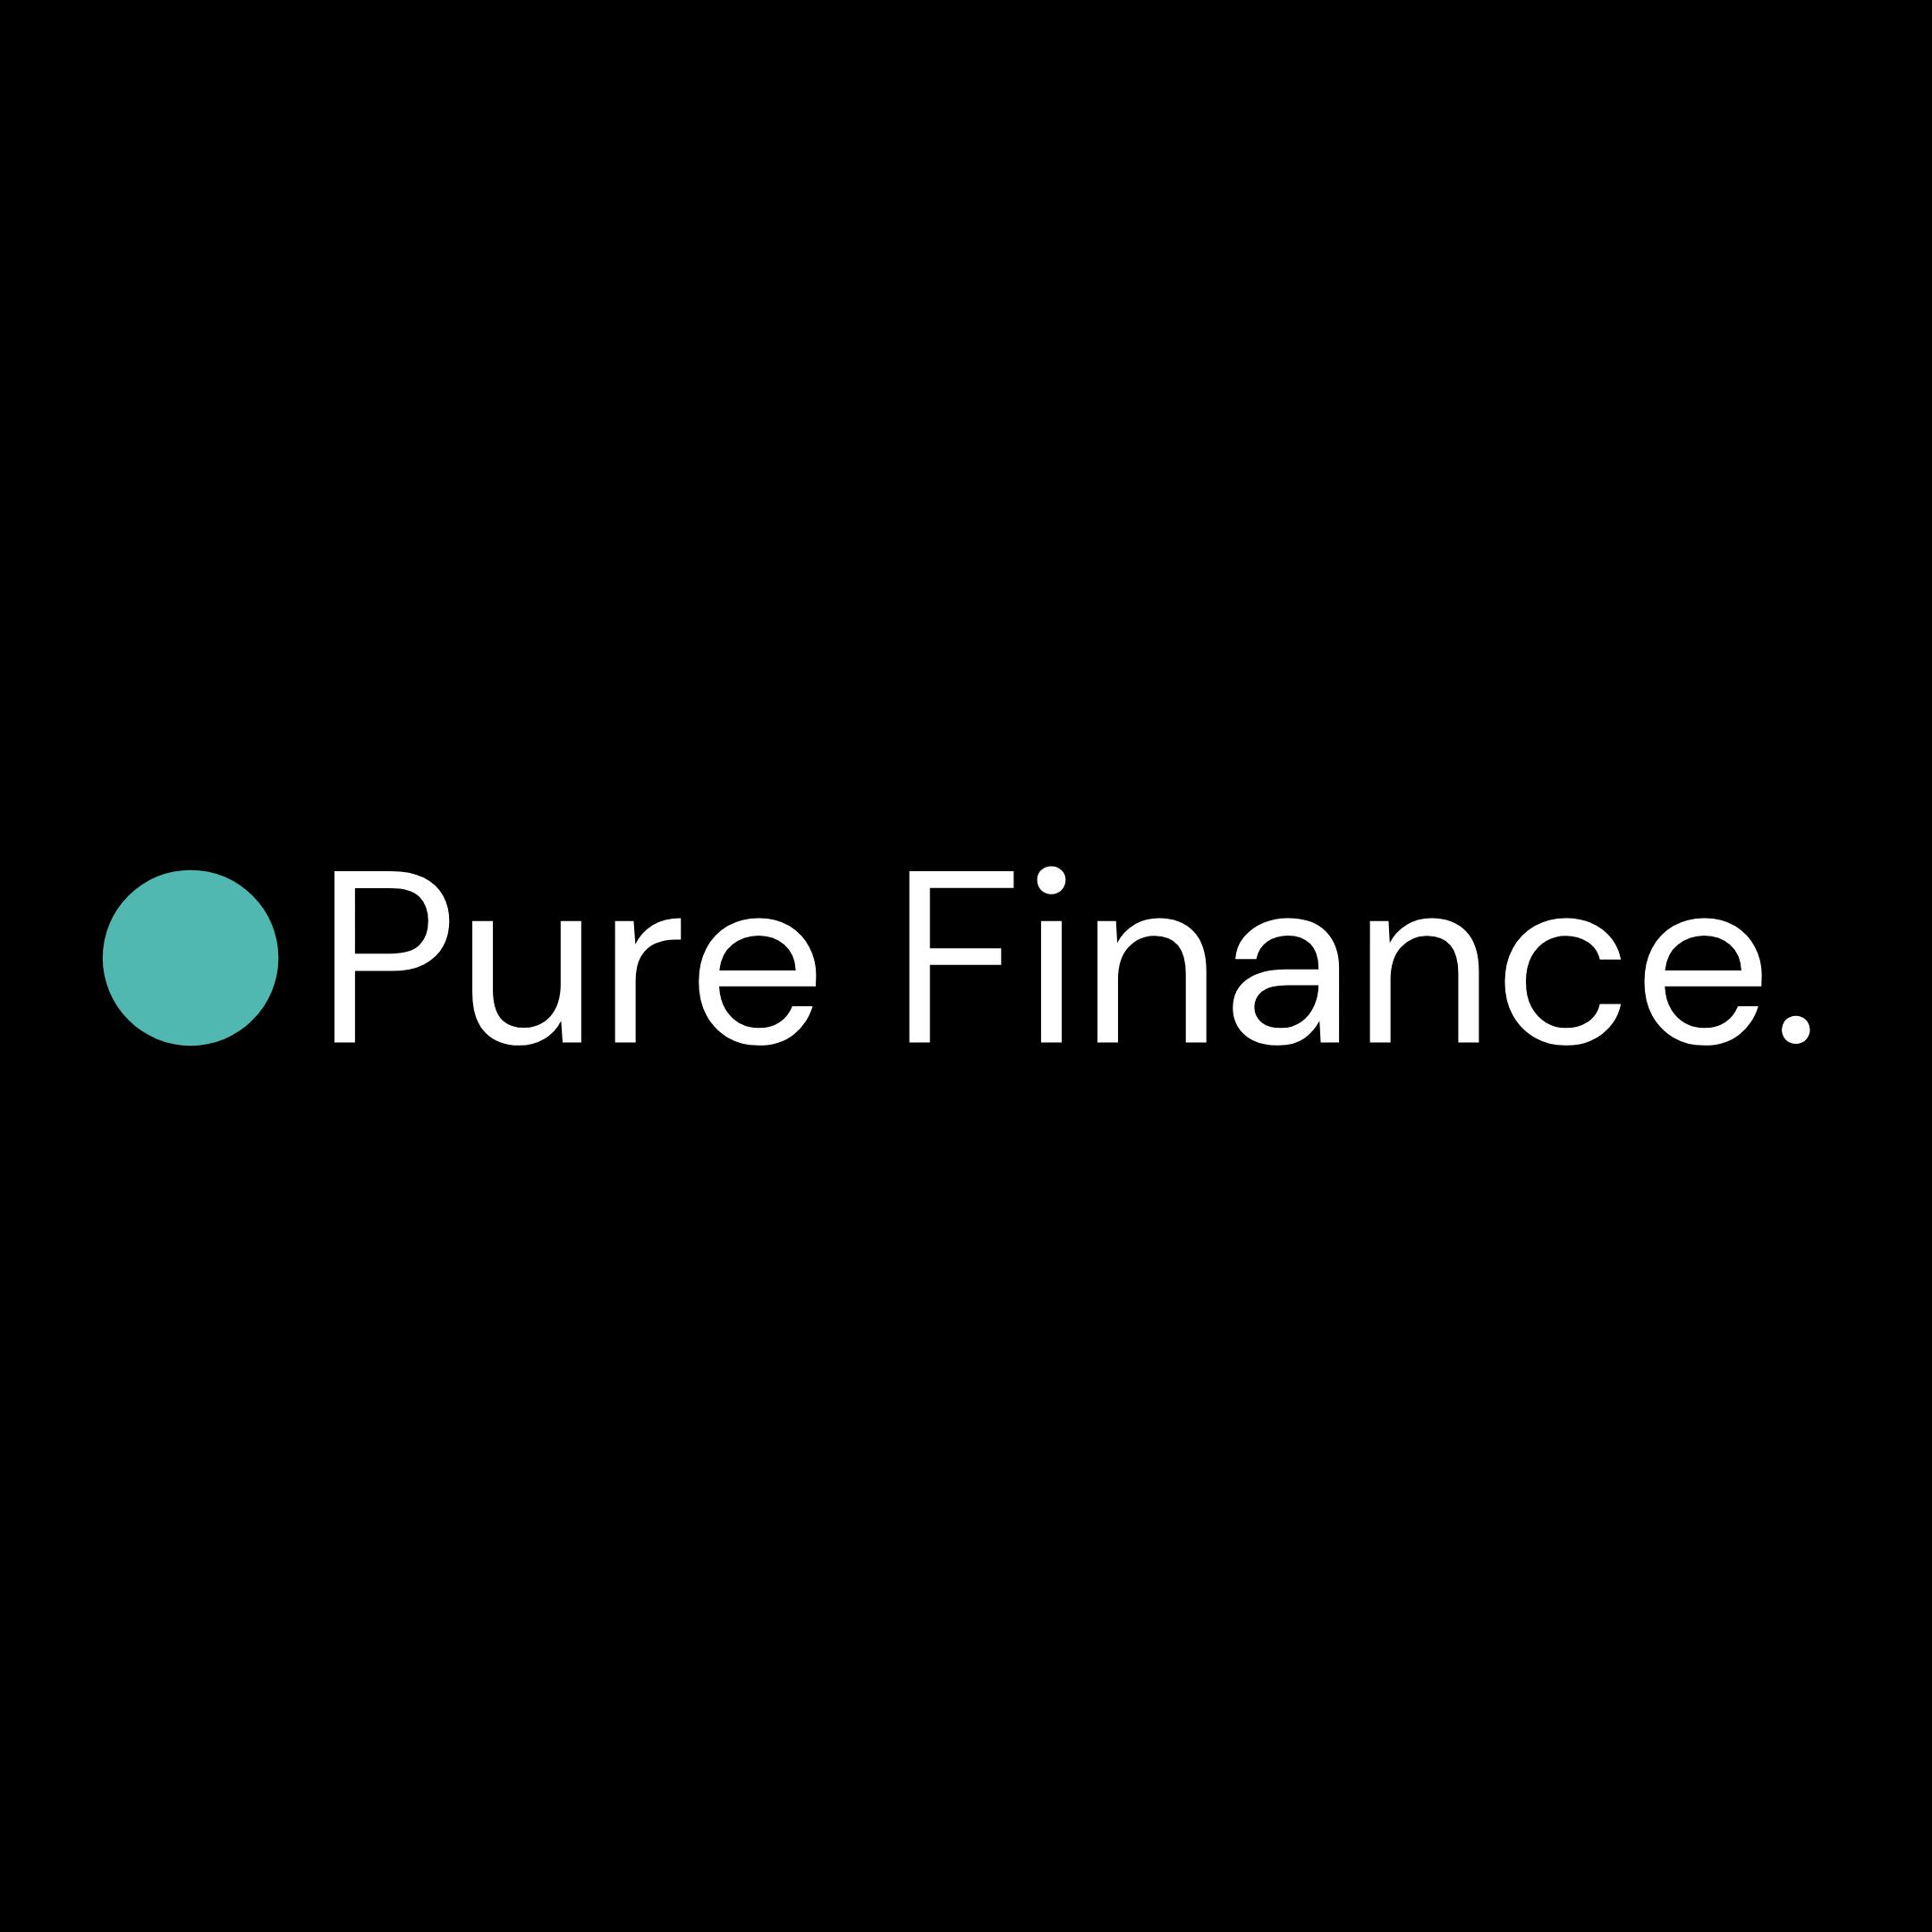 #FinanceForGood (purefinance) Profile Image | Linktree